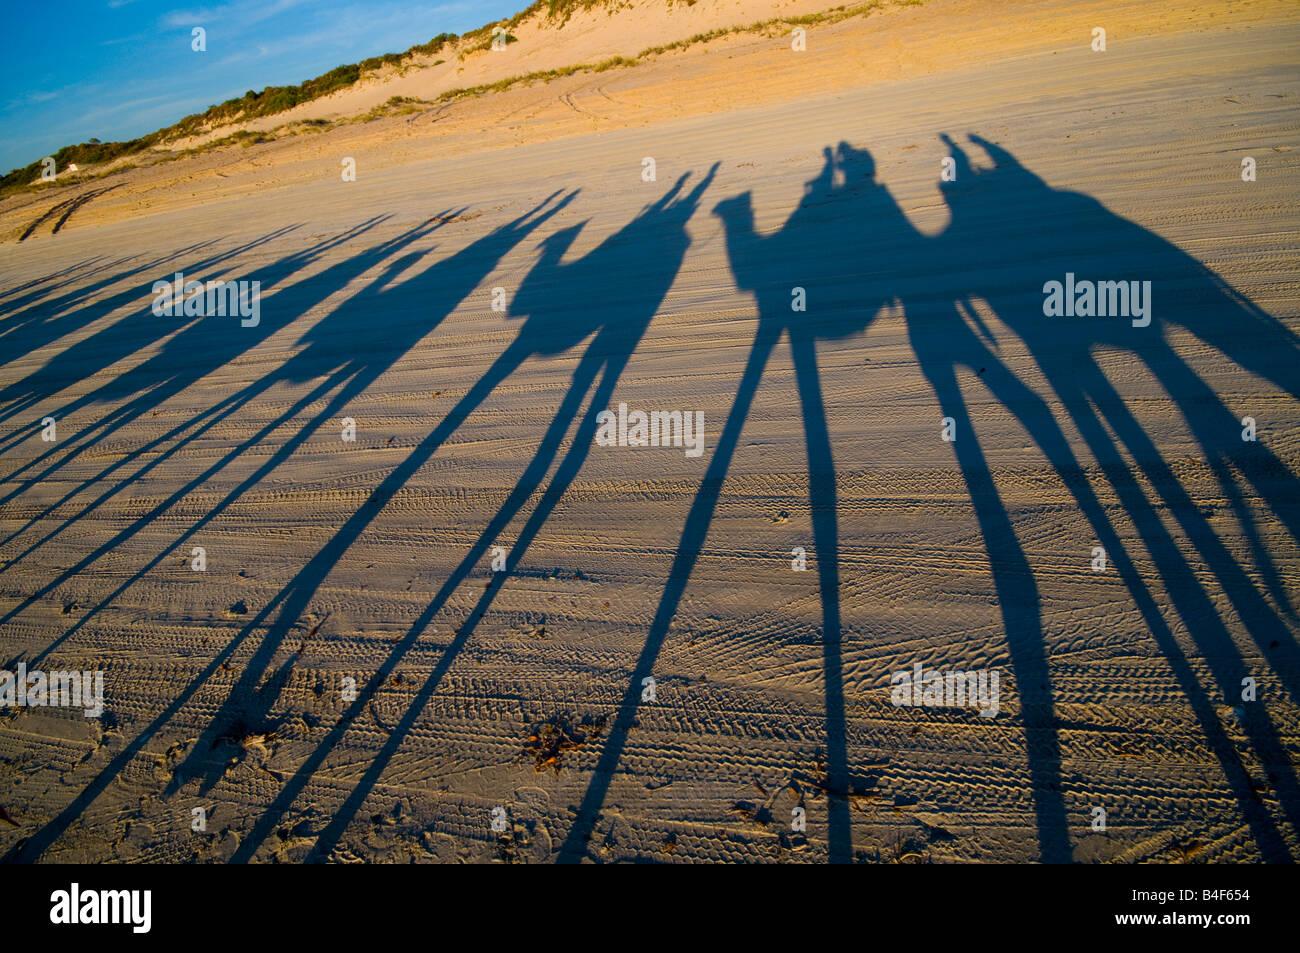 Kamelreiten bei Sonnenuntergang am Cable Beach Broome Western Australia Stockbild